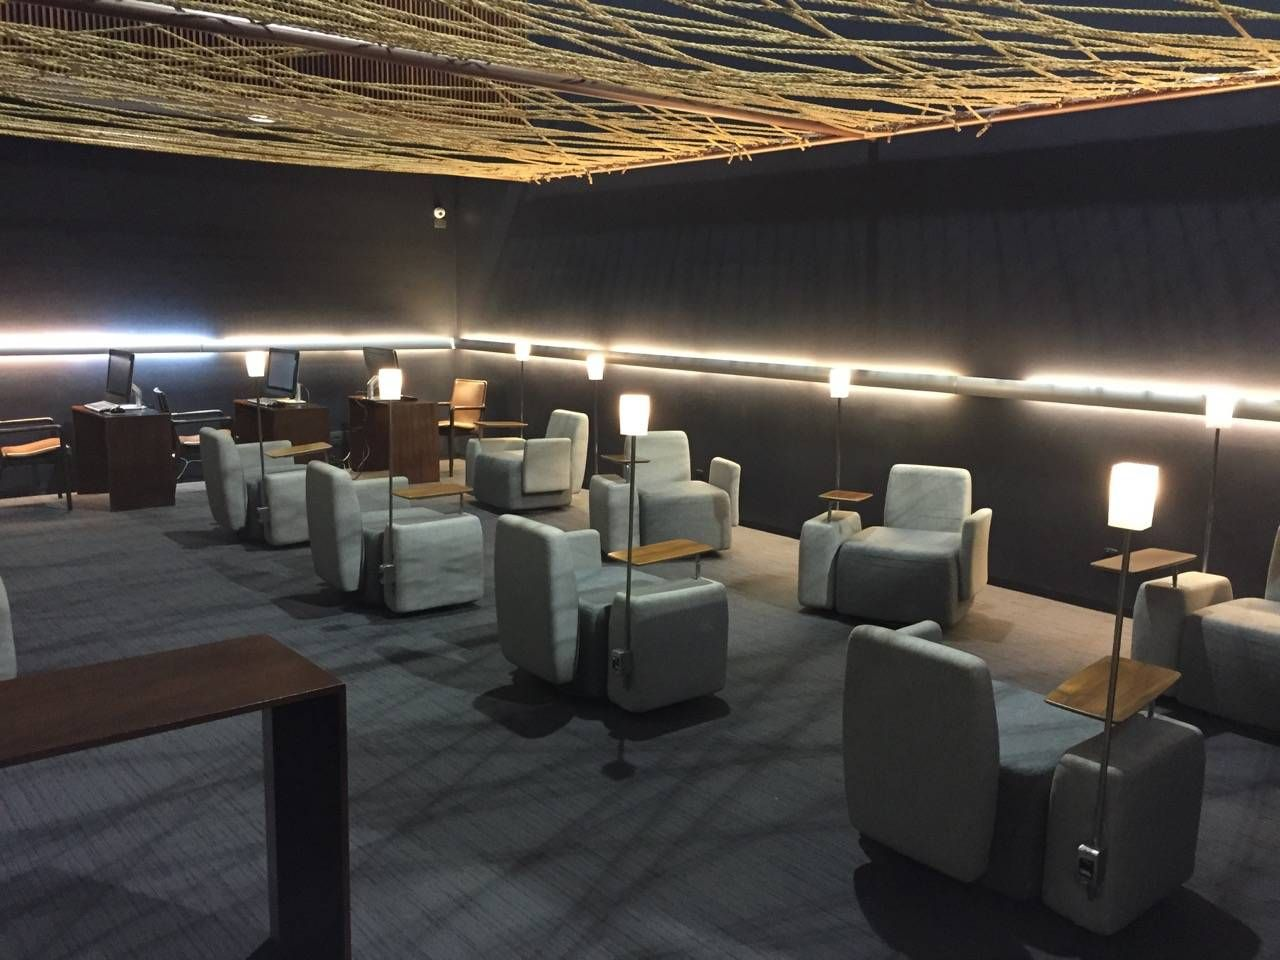 Star Alliance Lounge GRU-017